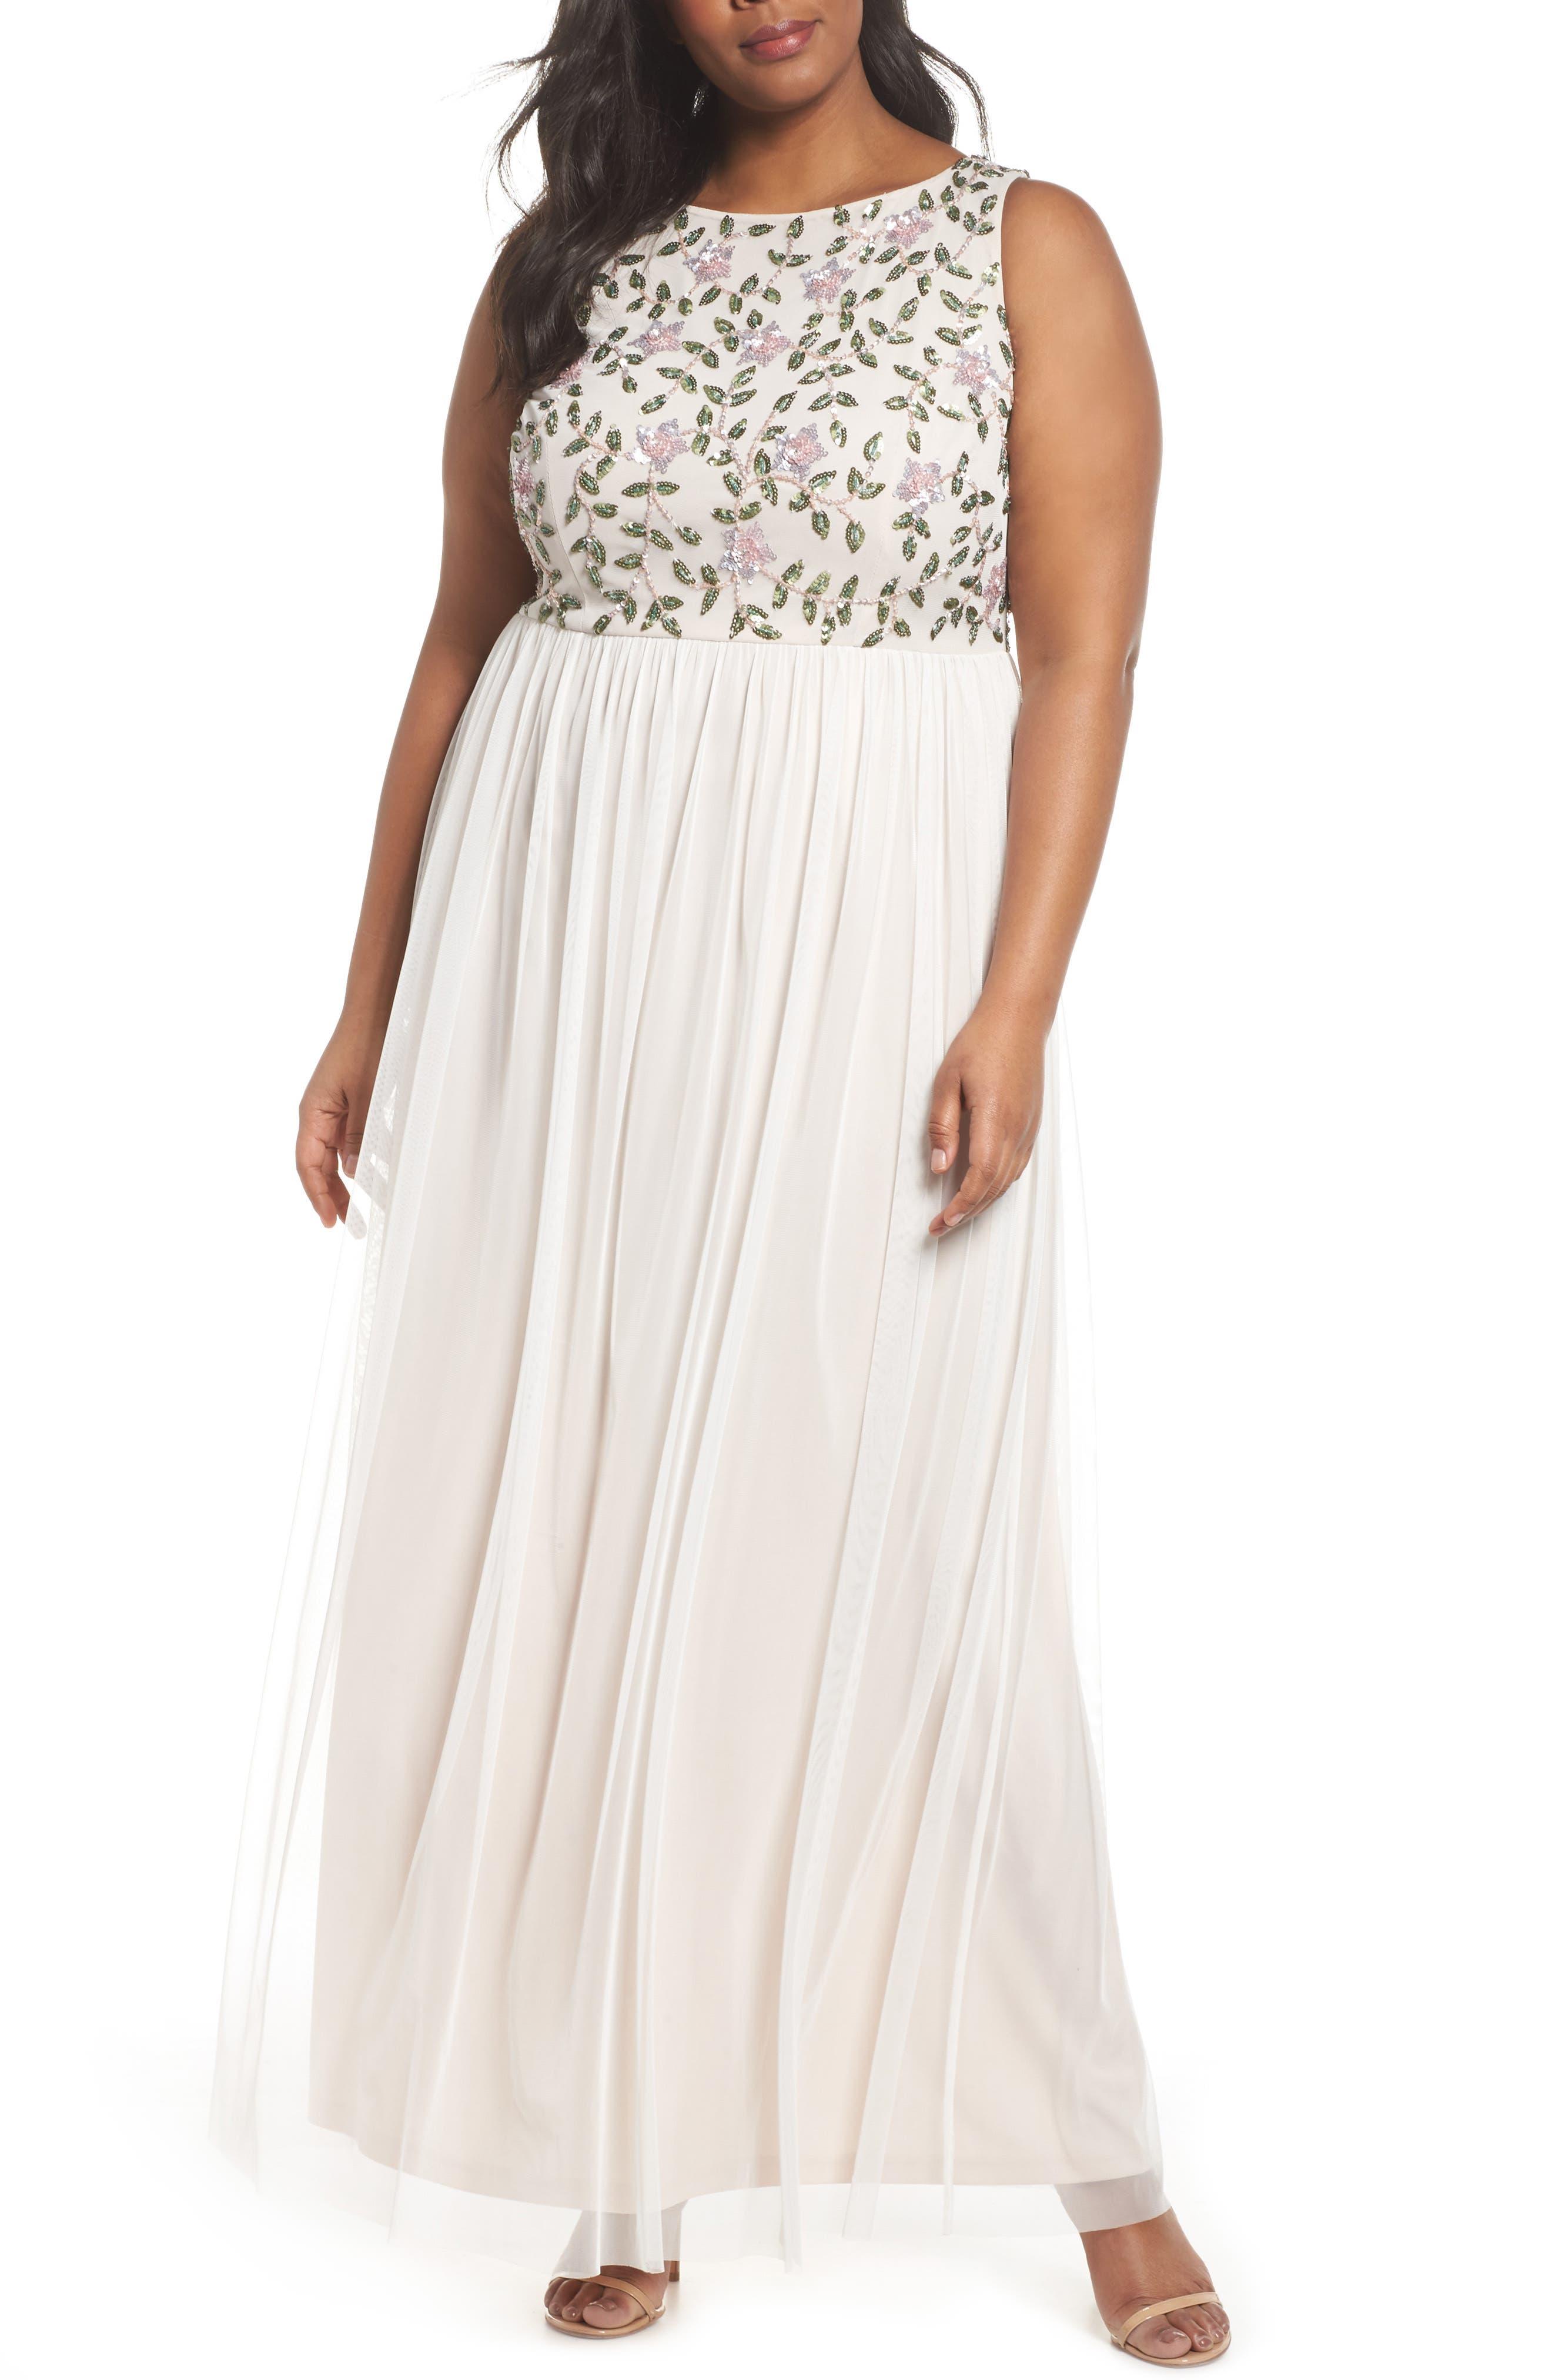 Floral Sequin Bodice Gown,                             Main thumbnail 1, color,                             900